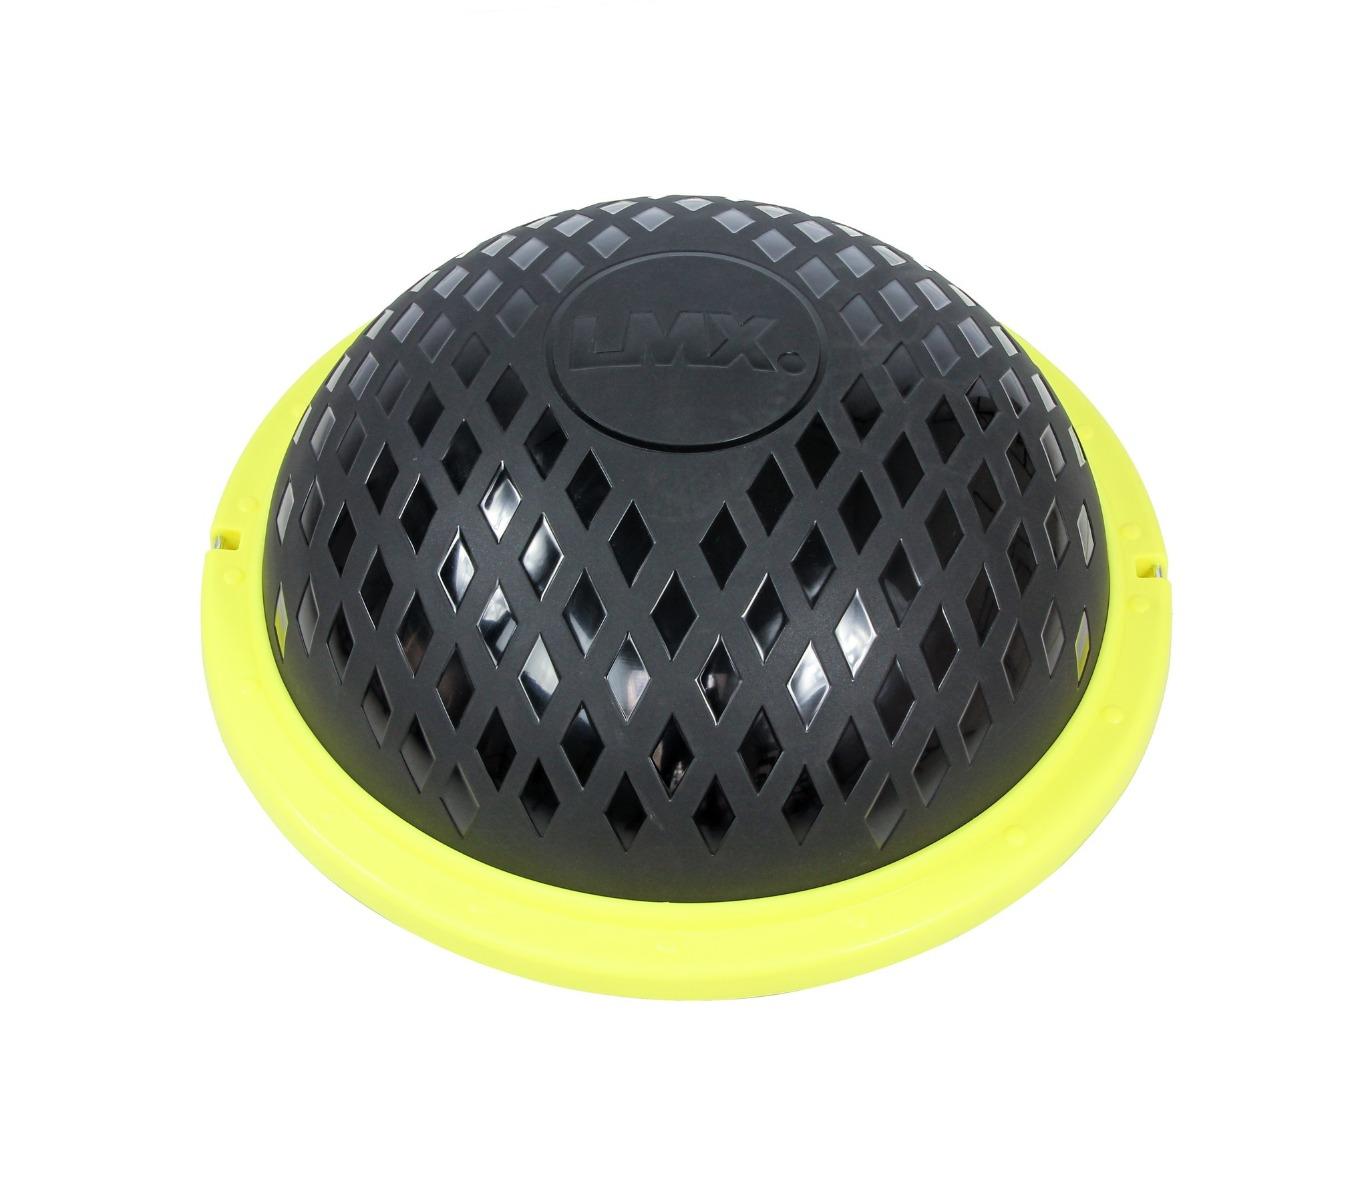 LMX Balance Dome – Zwart met geel – 60x22cm jokasport.nl